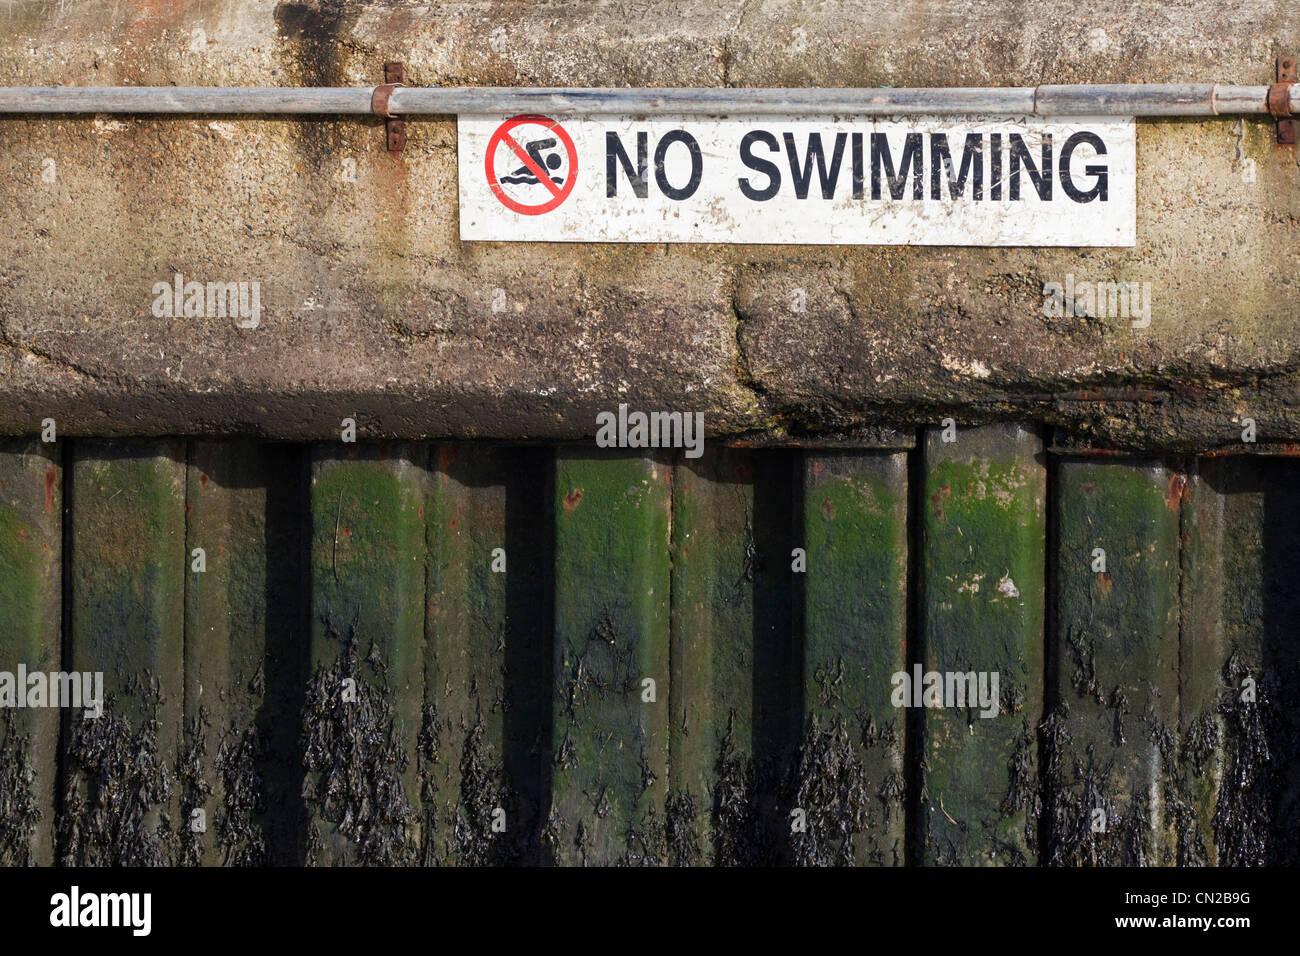 No swimming warning sign, UK - Stock Image